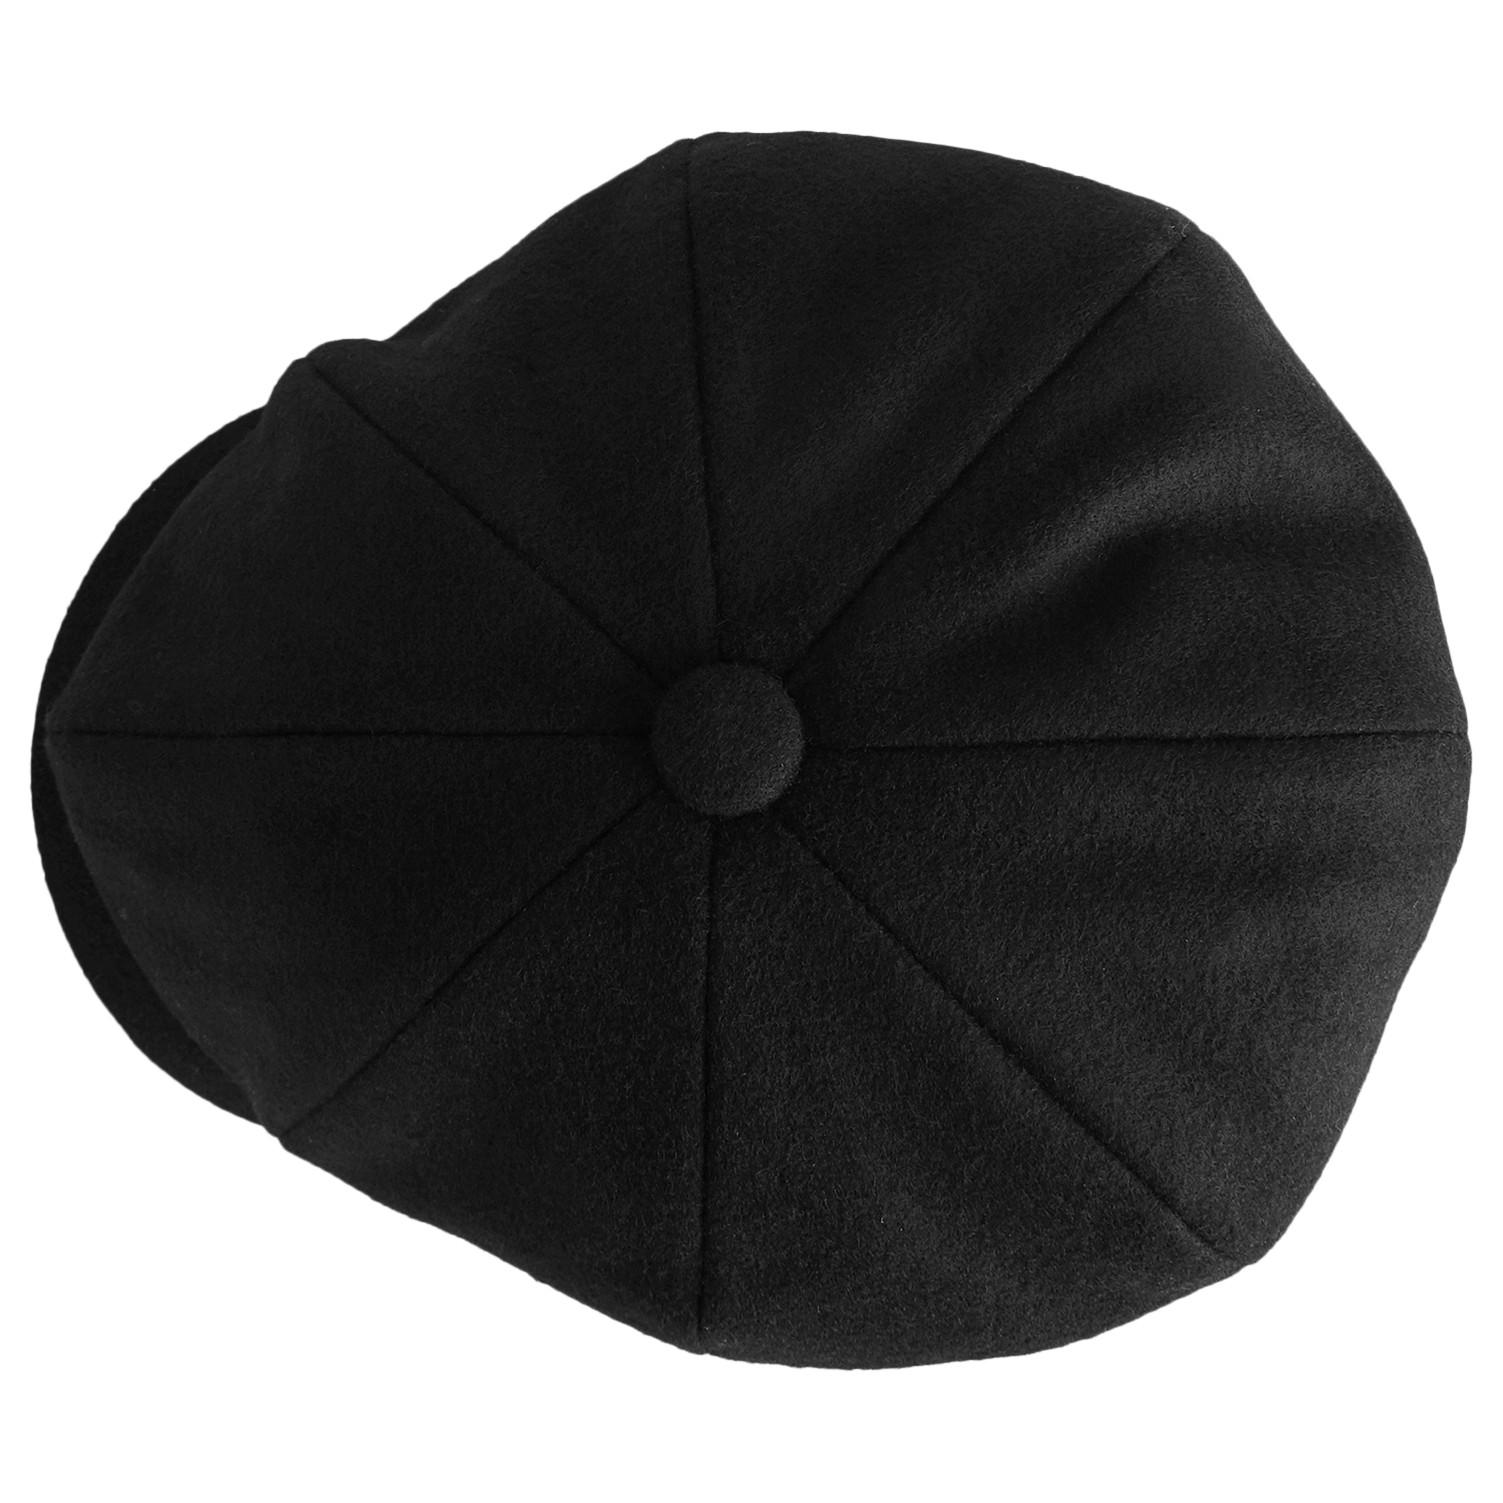 25501d62 Reiss Shelby Baker Boy Cap in Black for Men - Lyst